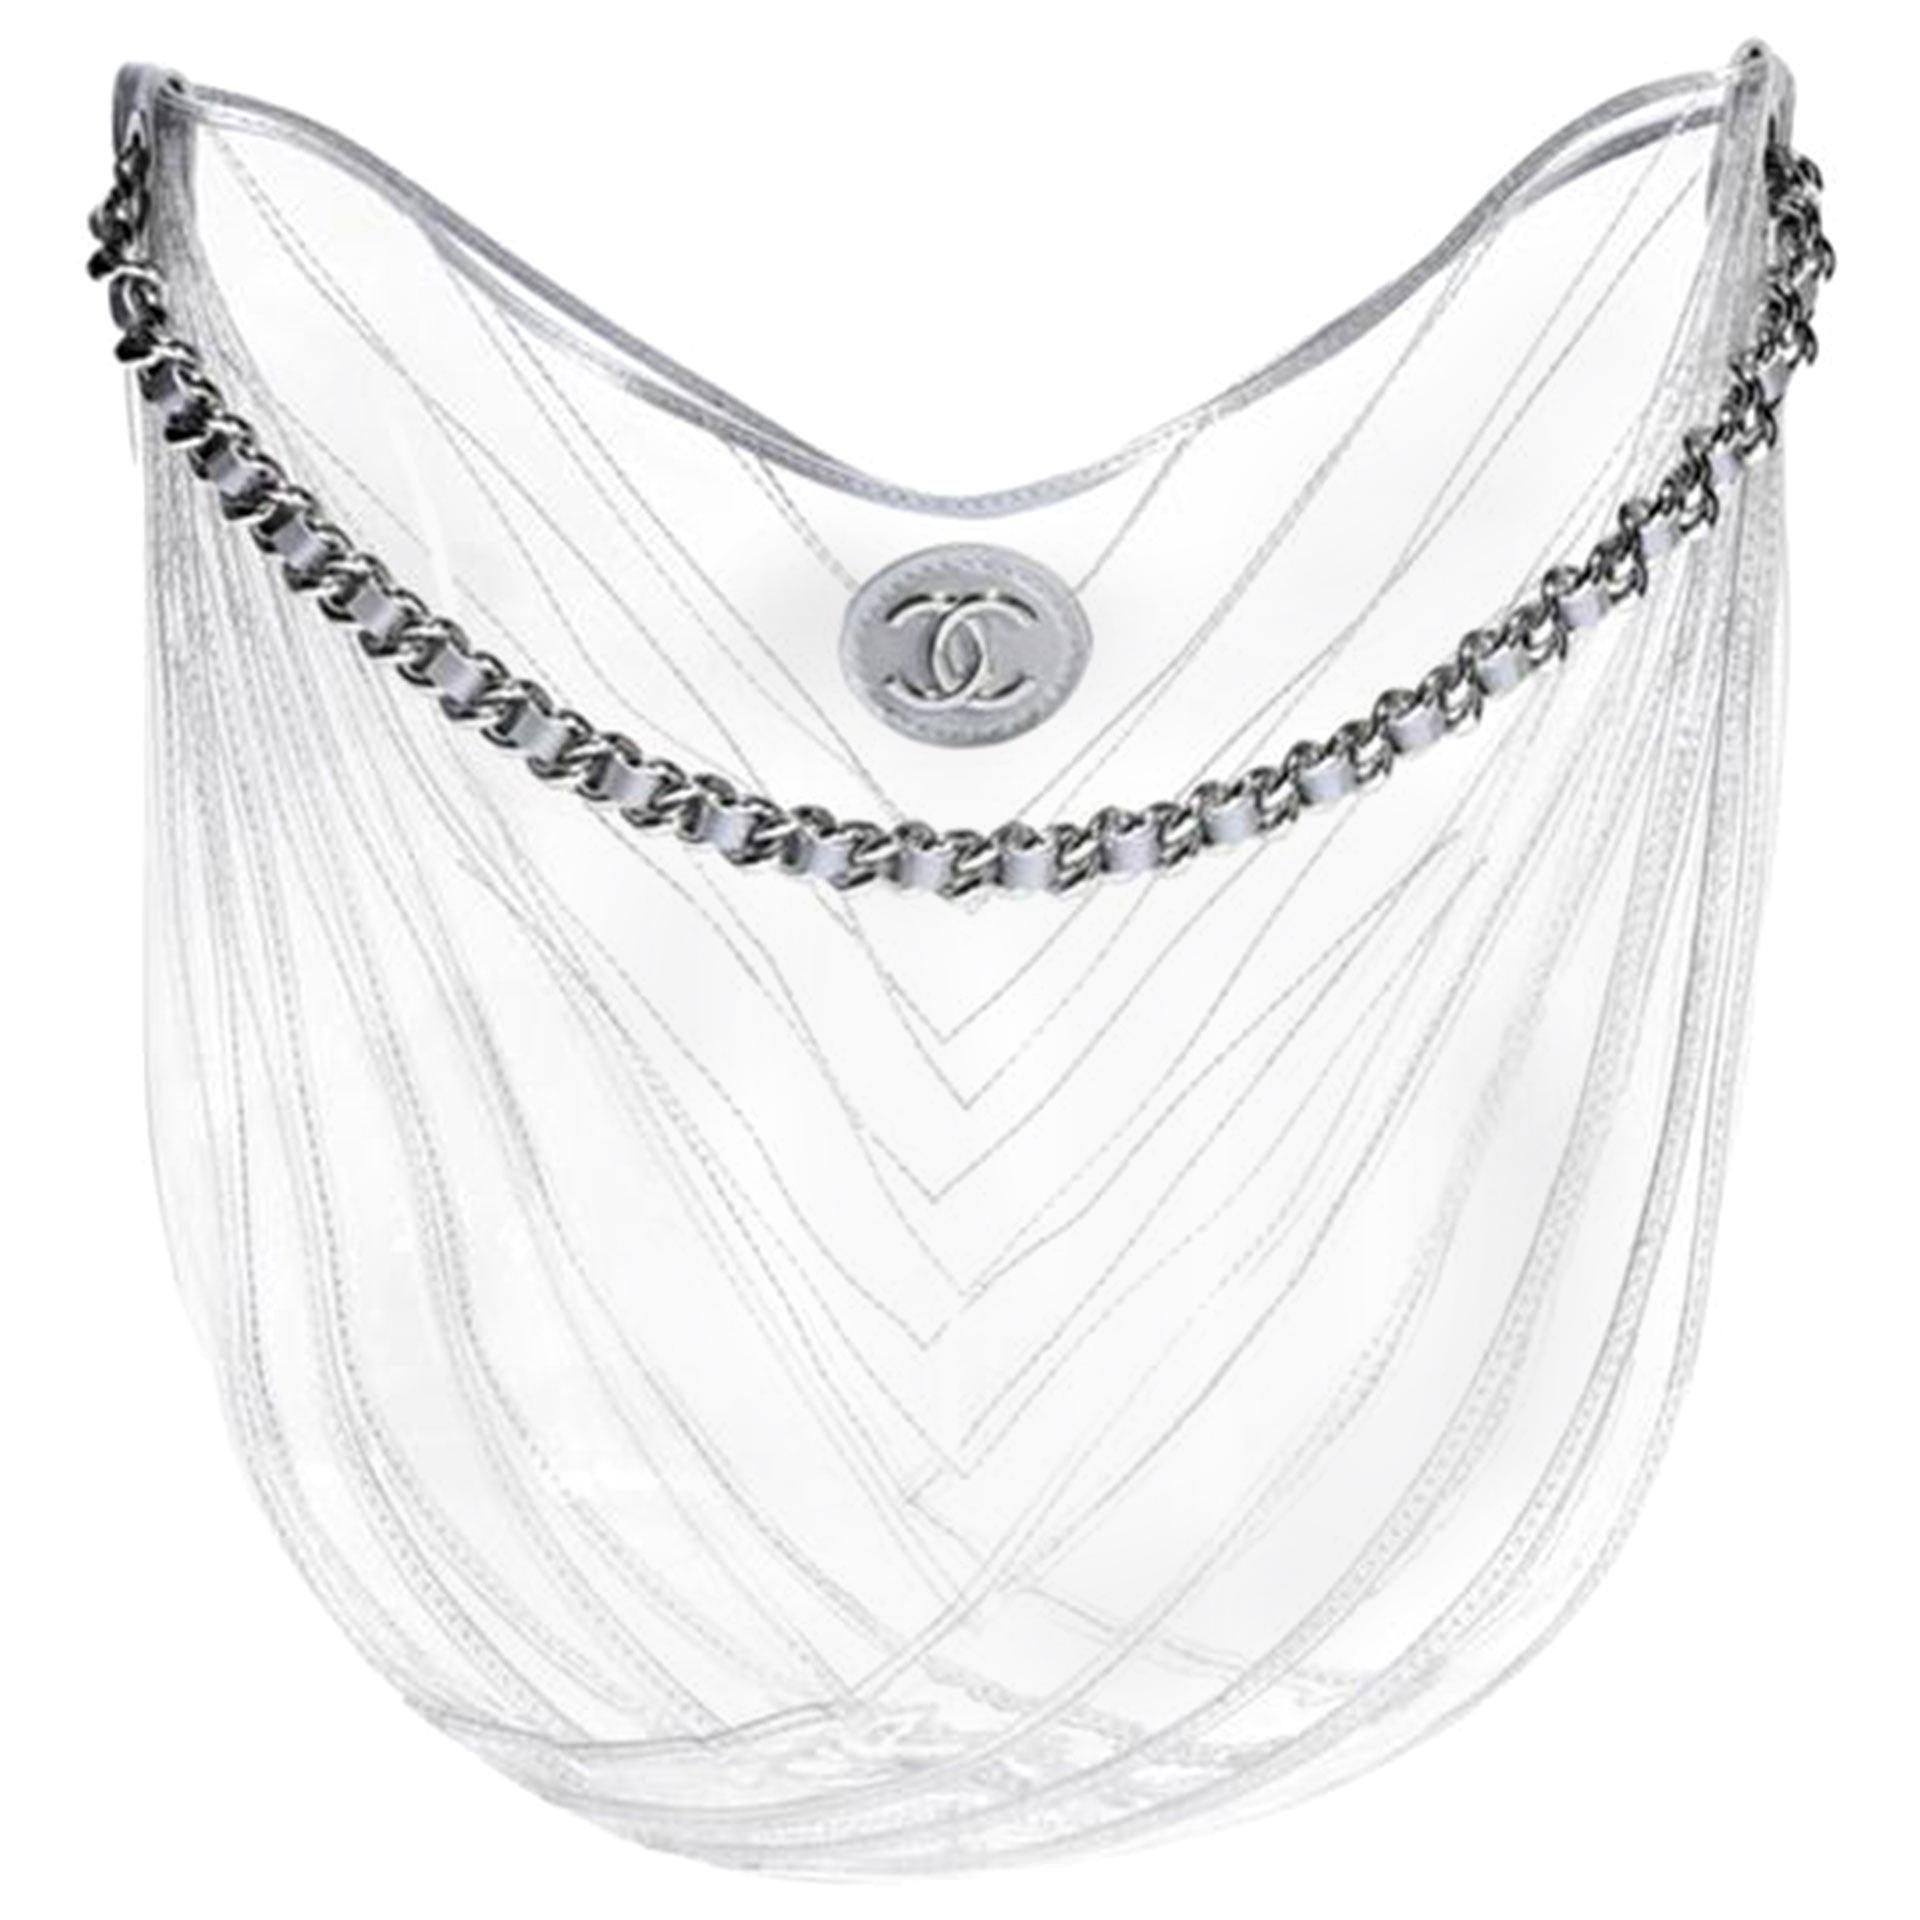 Chanel Hobo Handbag Transparent Teardrop Spring 2018 Clear Pvc Satchel